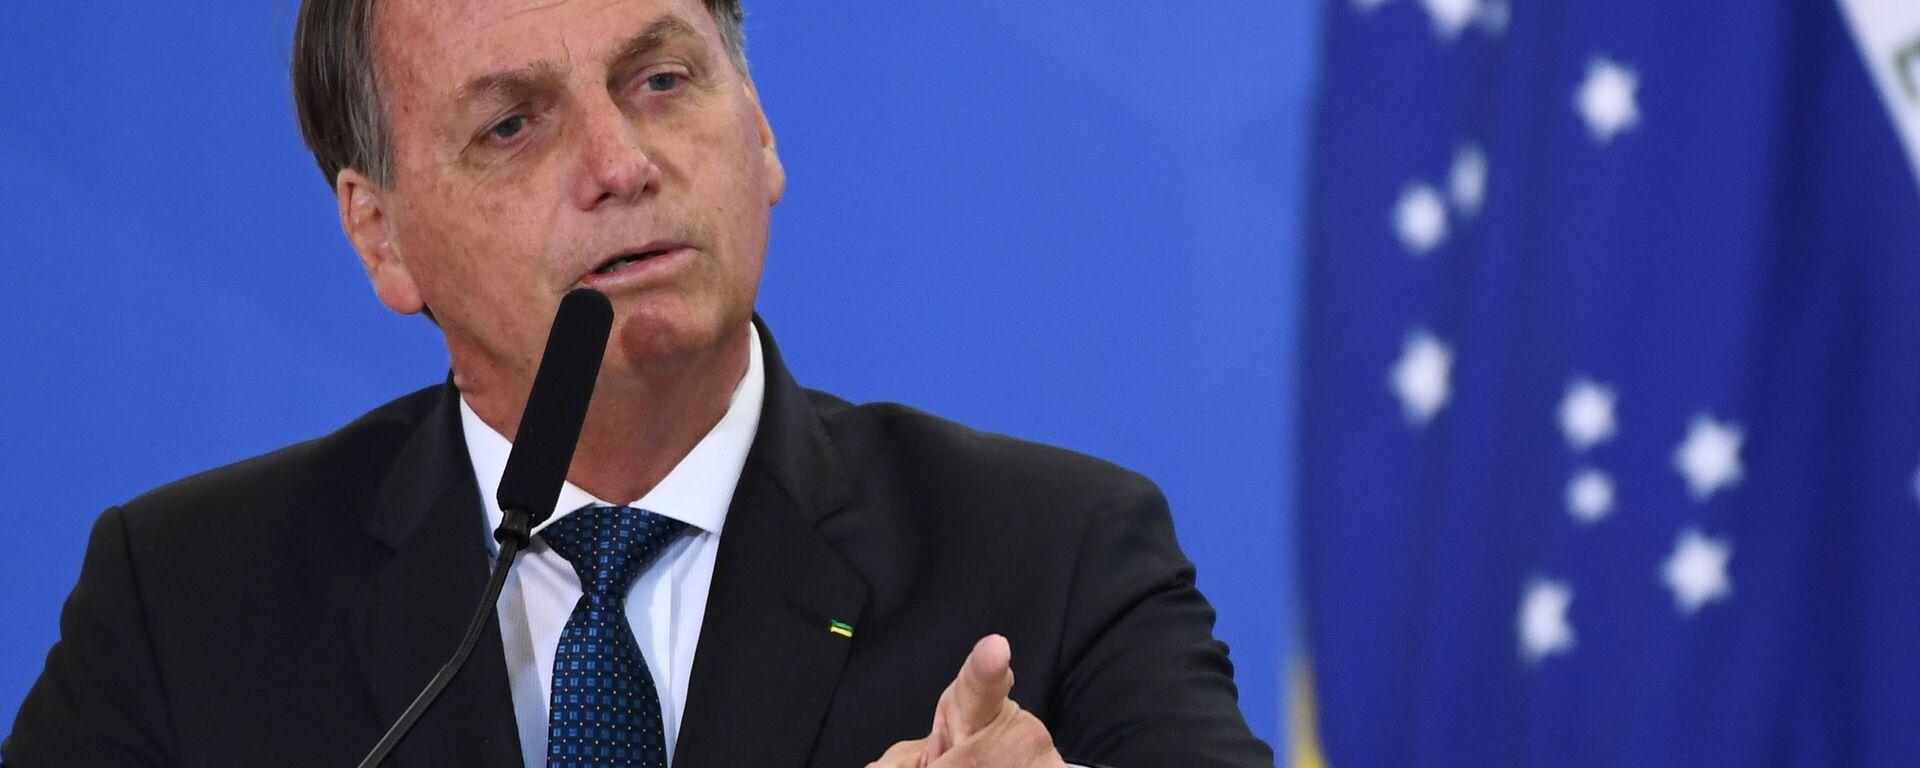 Jair Bolsonaro, presidente de Brasil - Sputnik Mundo, 1920, 08.02.2021